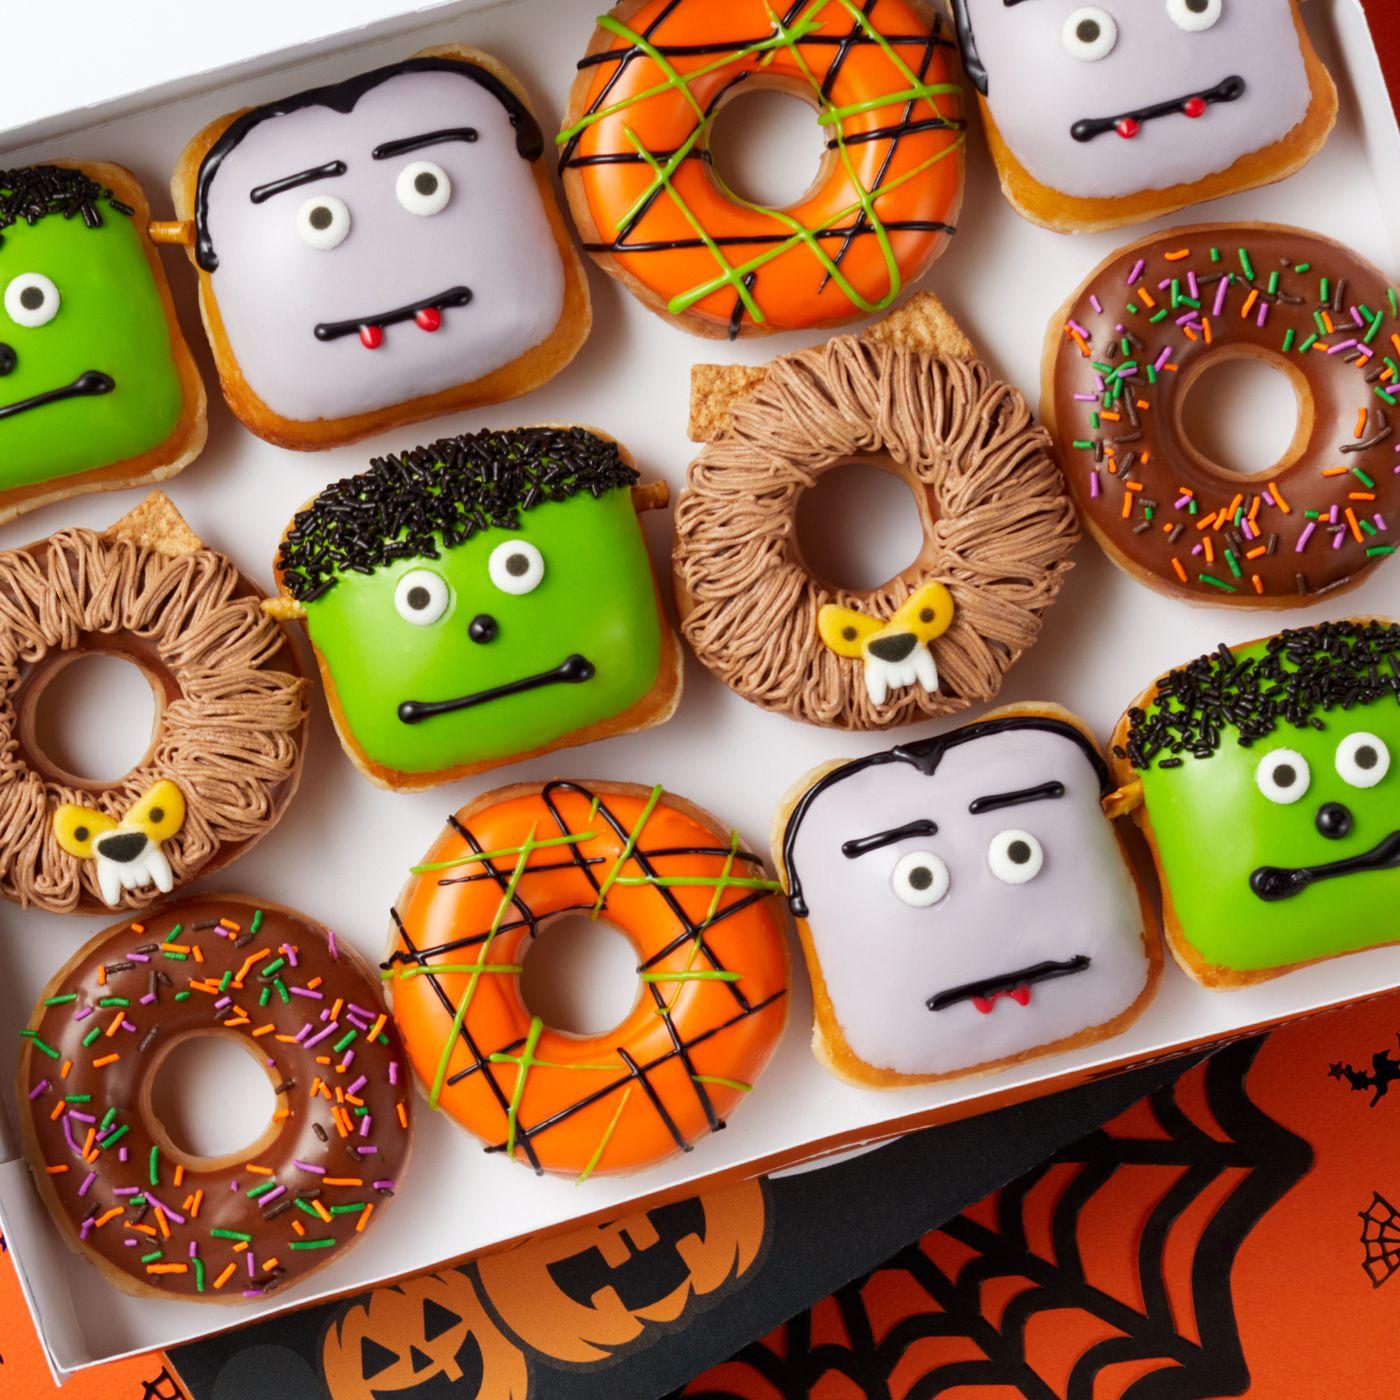 Krispy Kreme Halloween Doughnuts 2020 Flavors Krispy Kreme releases new Halloween theme doughnuts   Deseret News